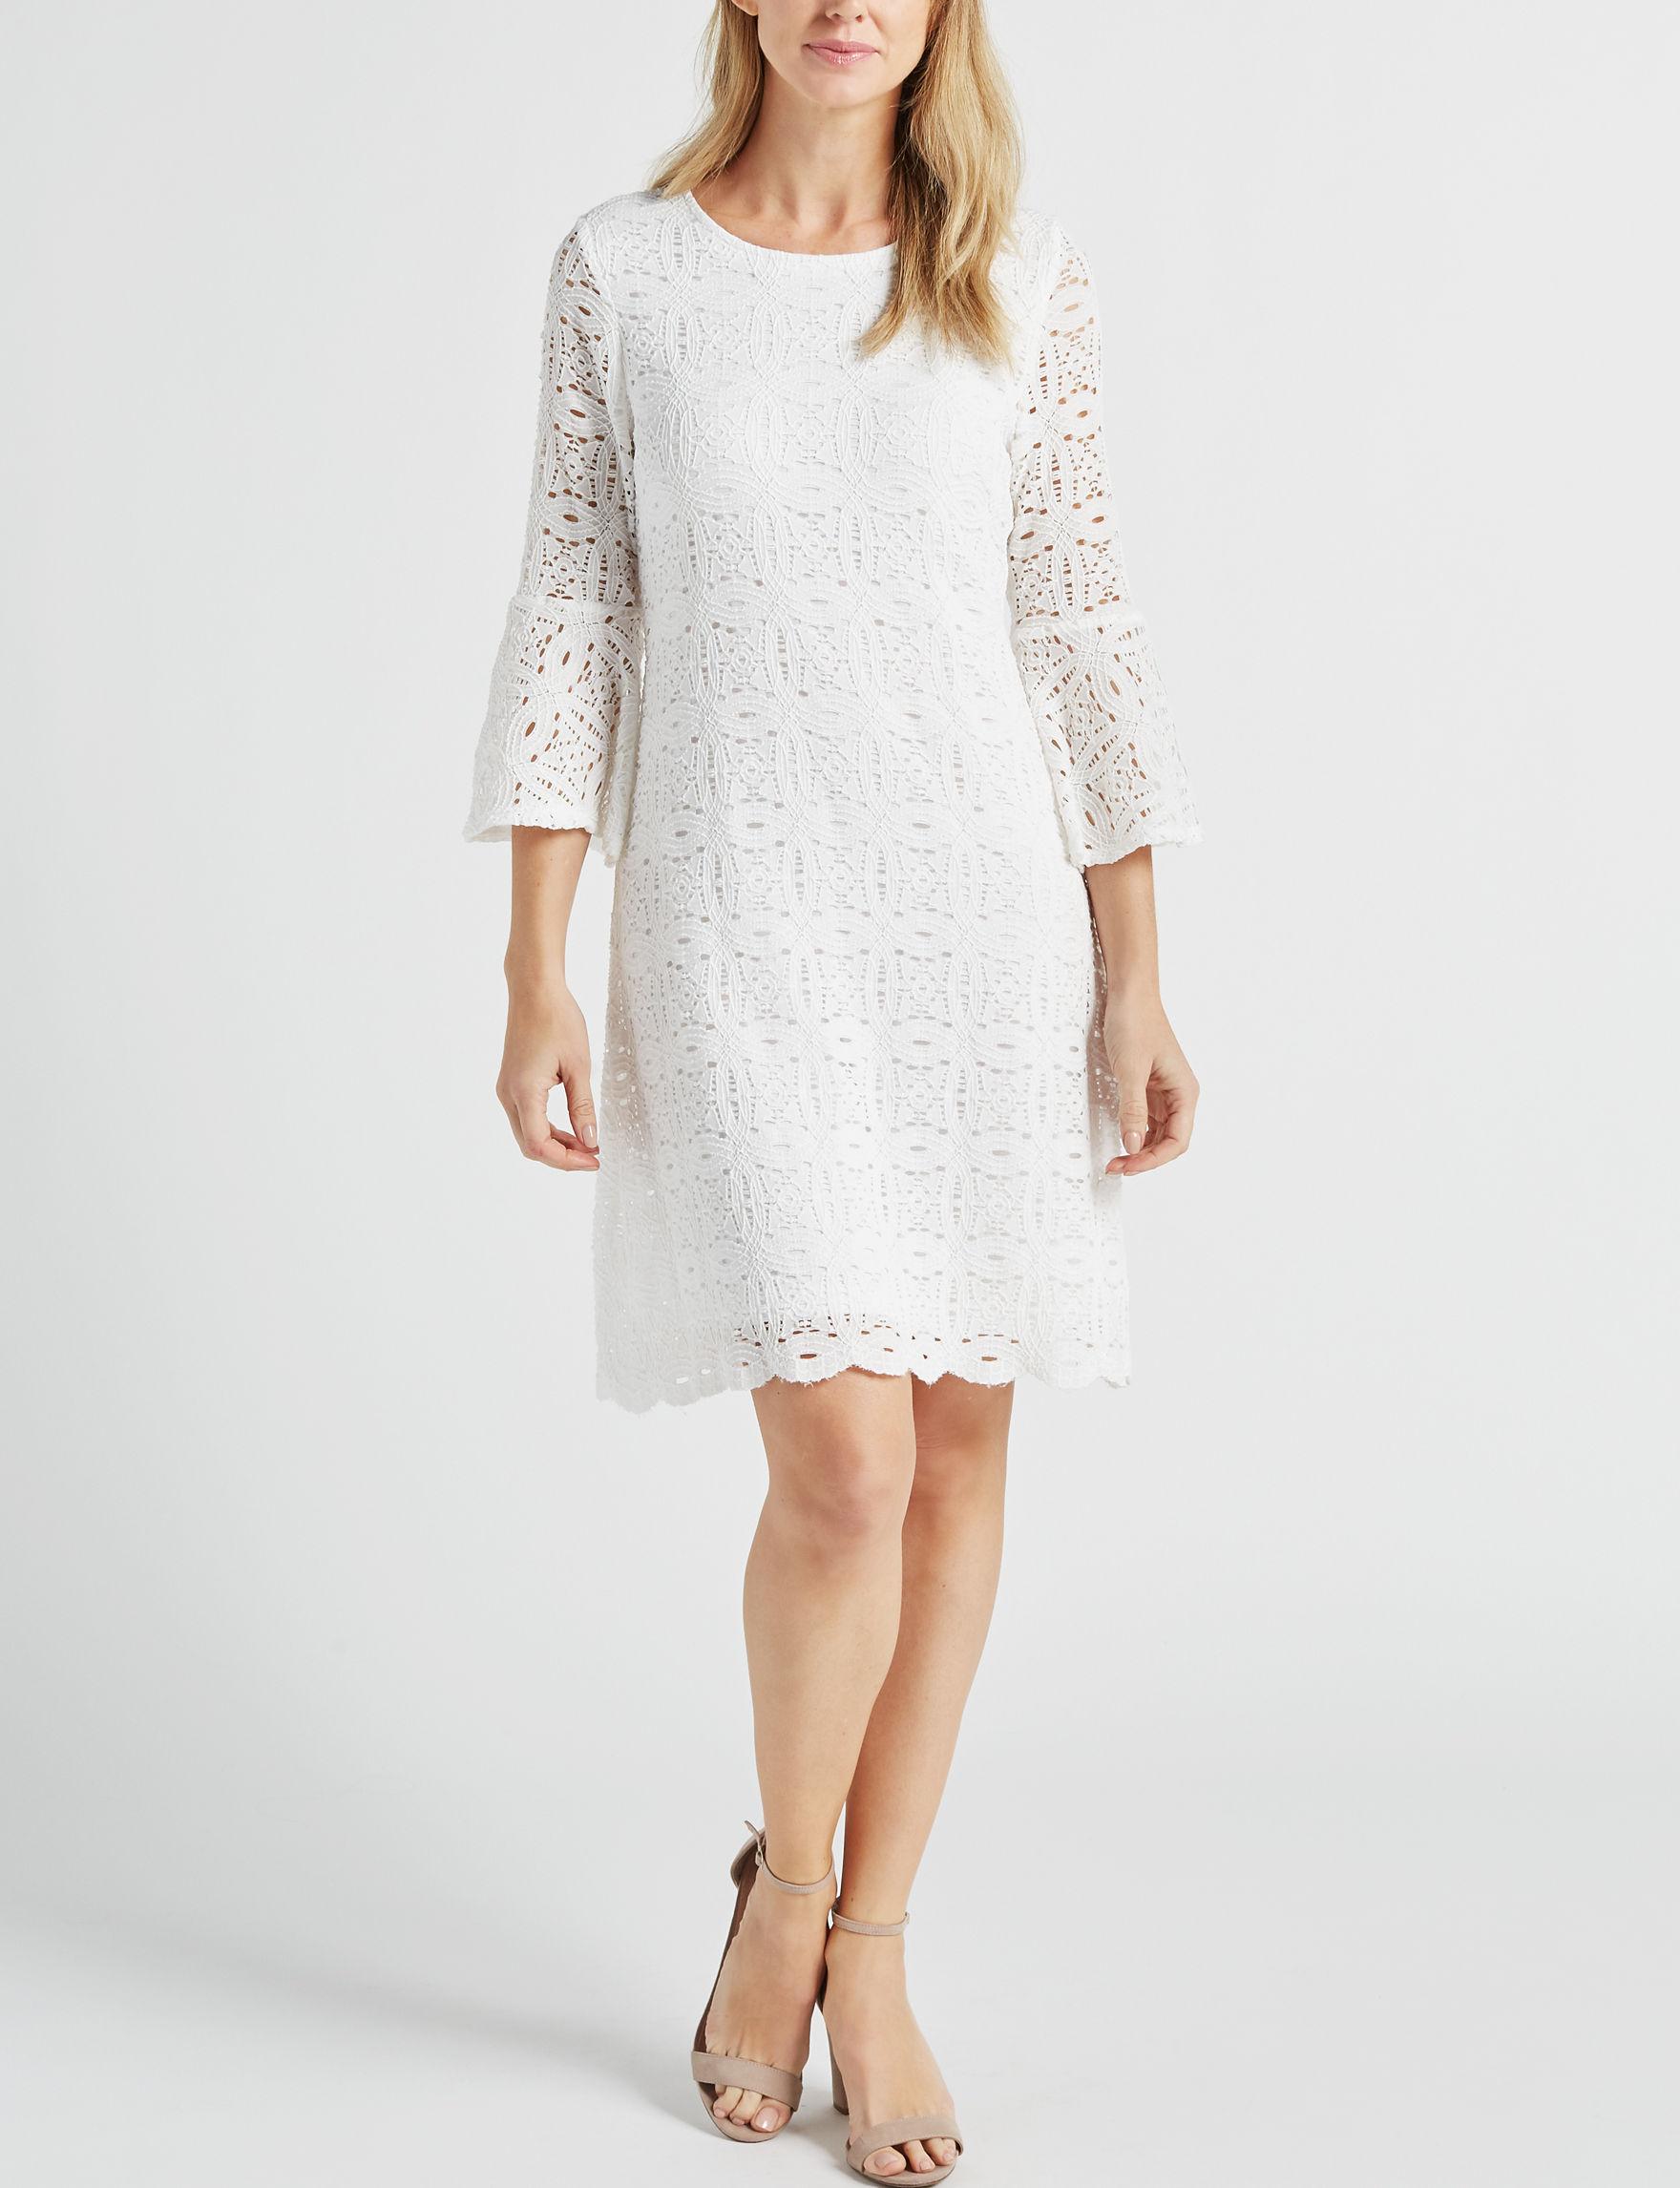 Ronni Nicole White Everyday & Casual Shift Dresses